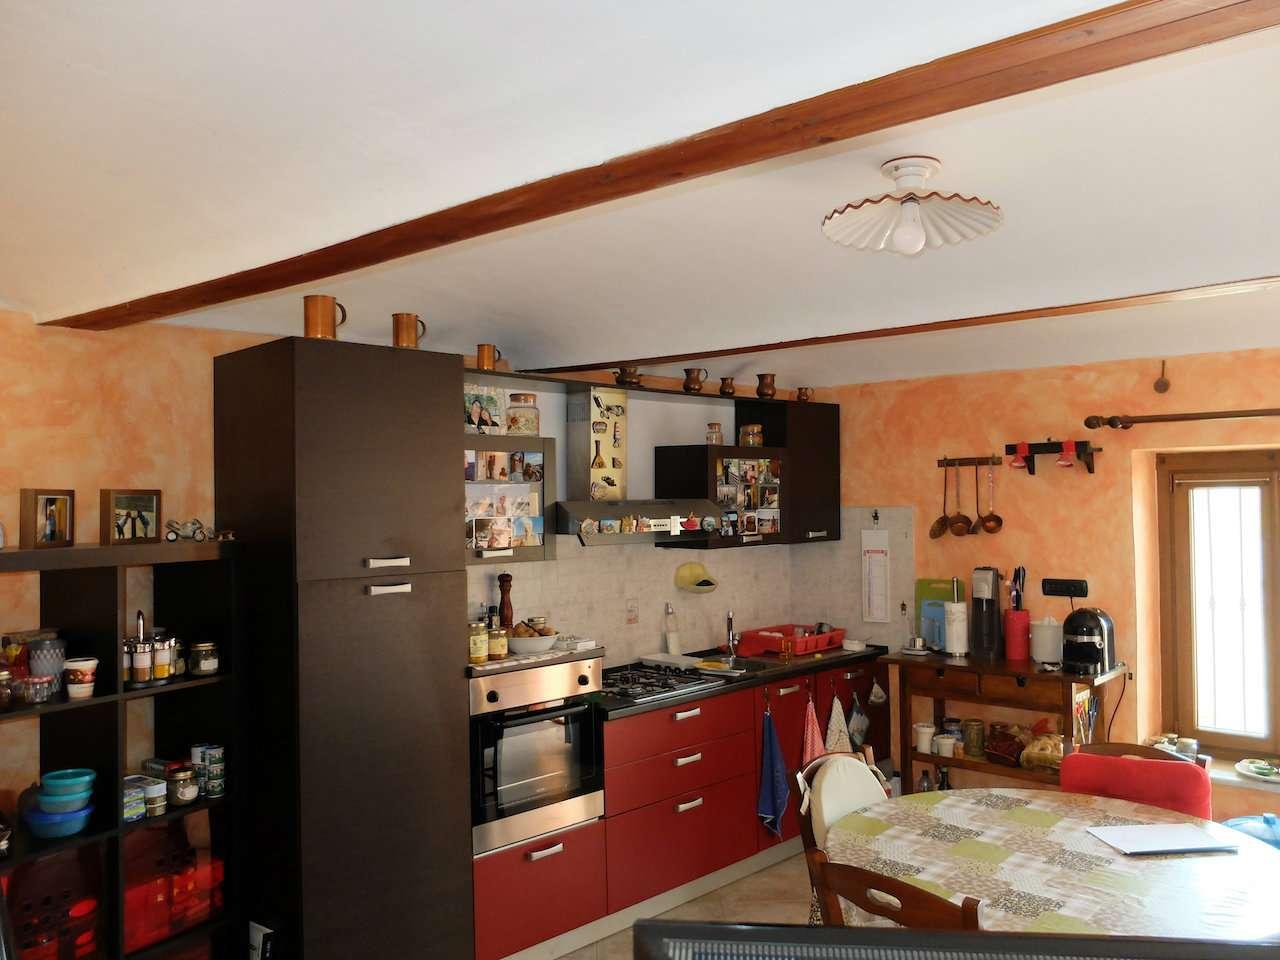 Casa indipendente in Vendita a Almese Periferia: 4 locali, 115 mq